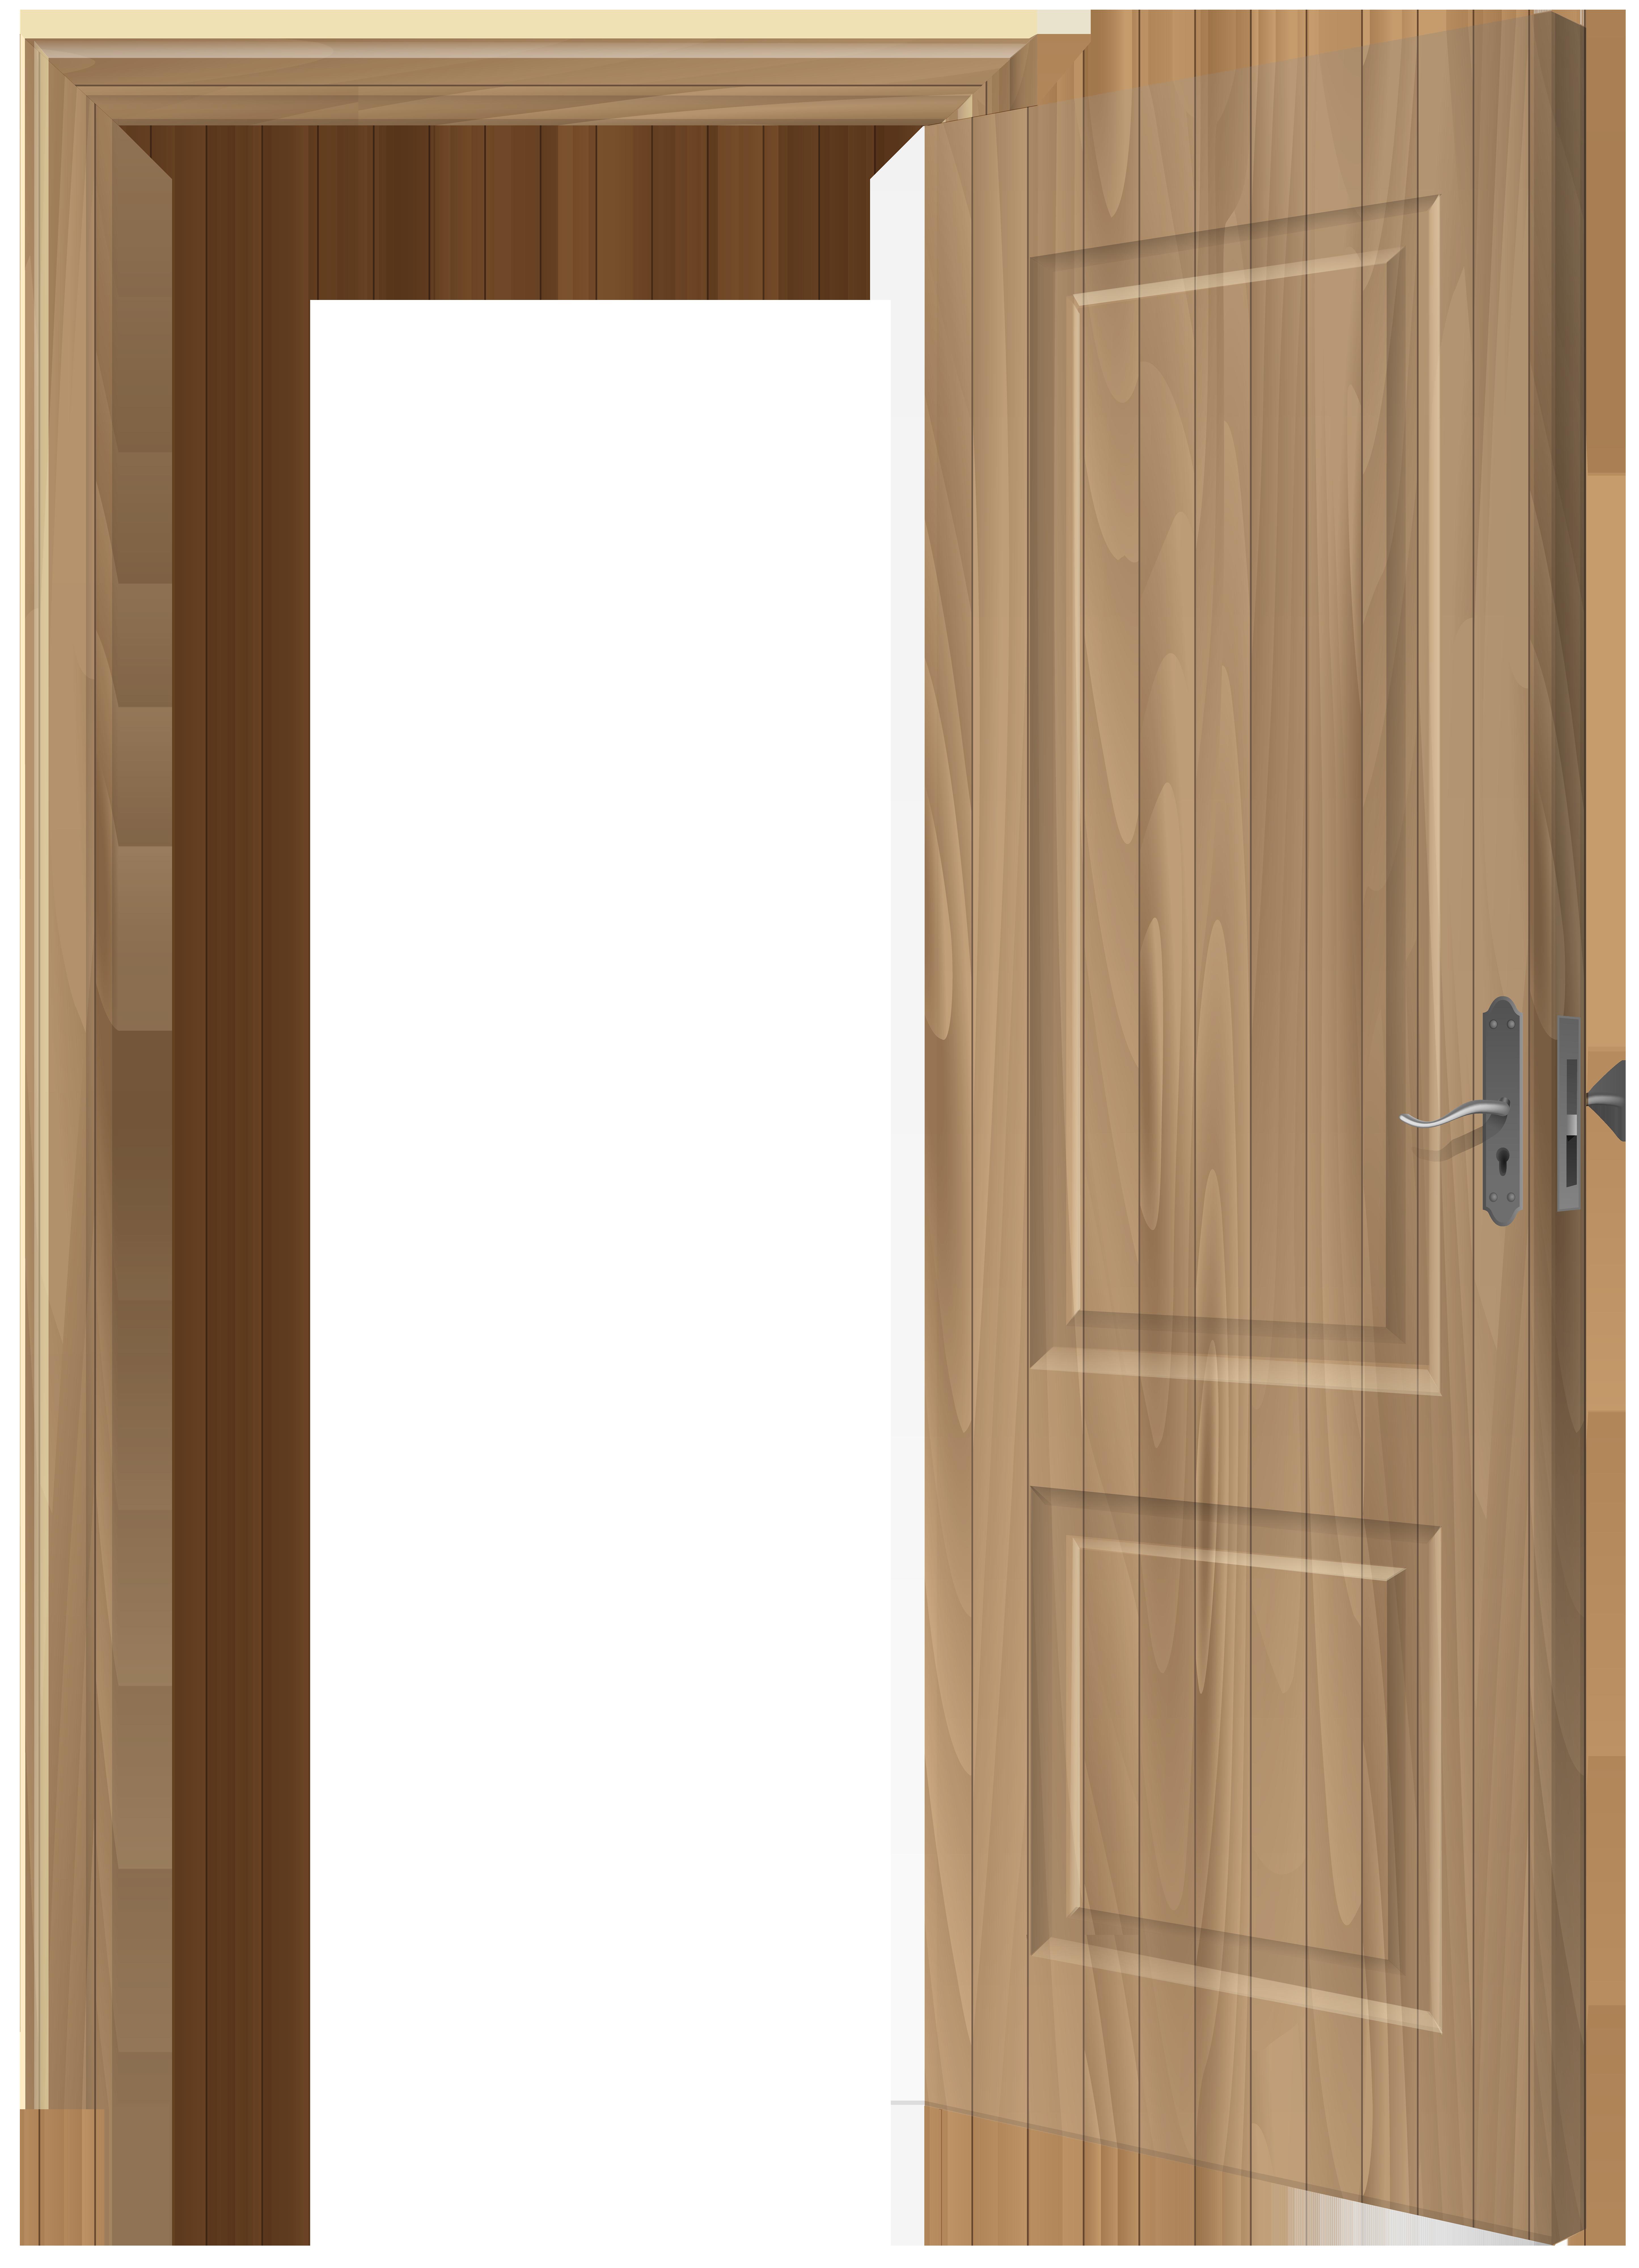 House with open door clipart image royalty free Open Wooden Door PNG Clip Art - Best WEB Clipart image royalty free